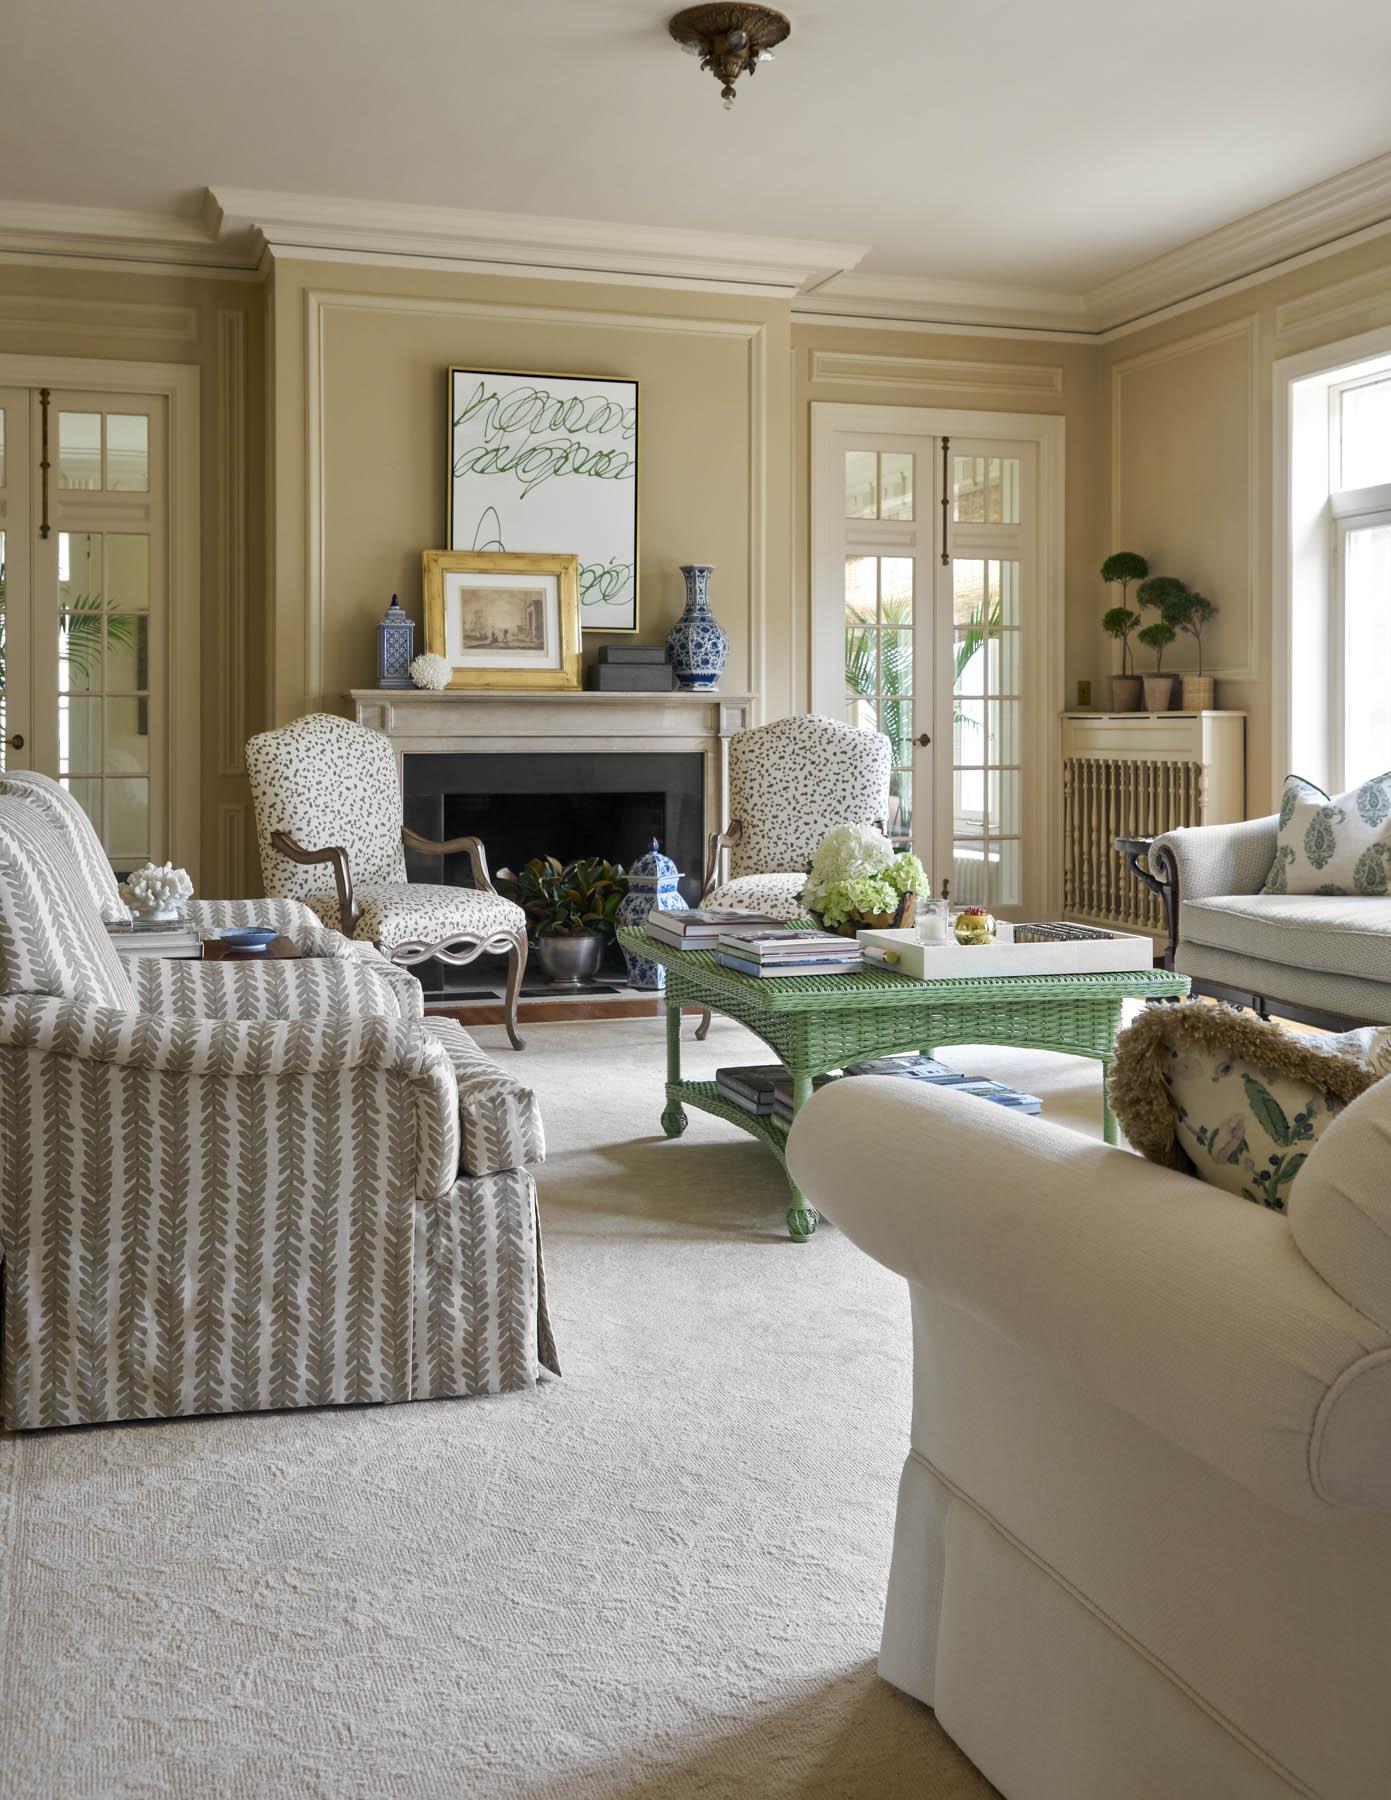 image via Kerry Spears Interiors